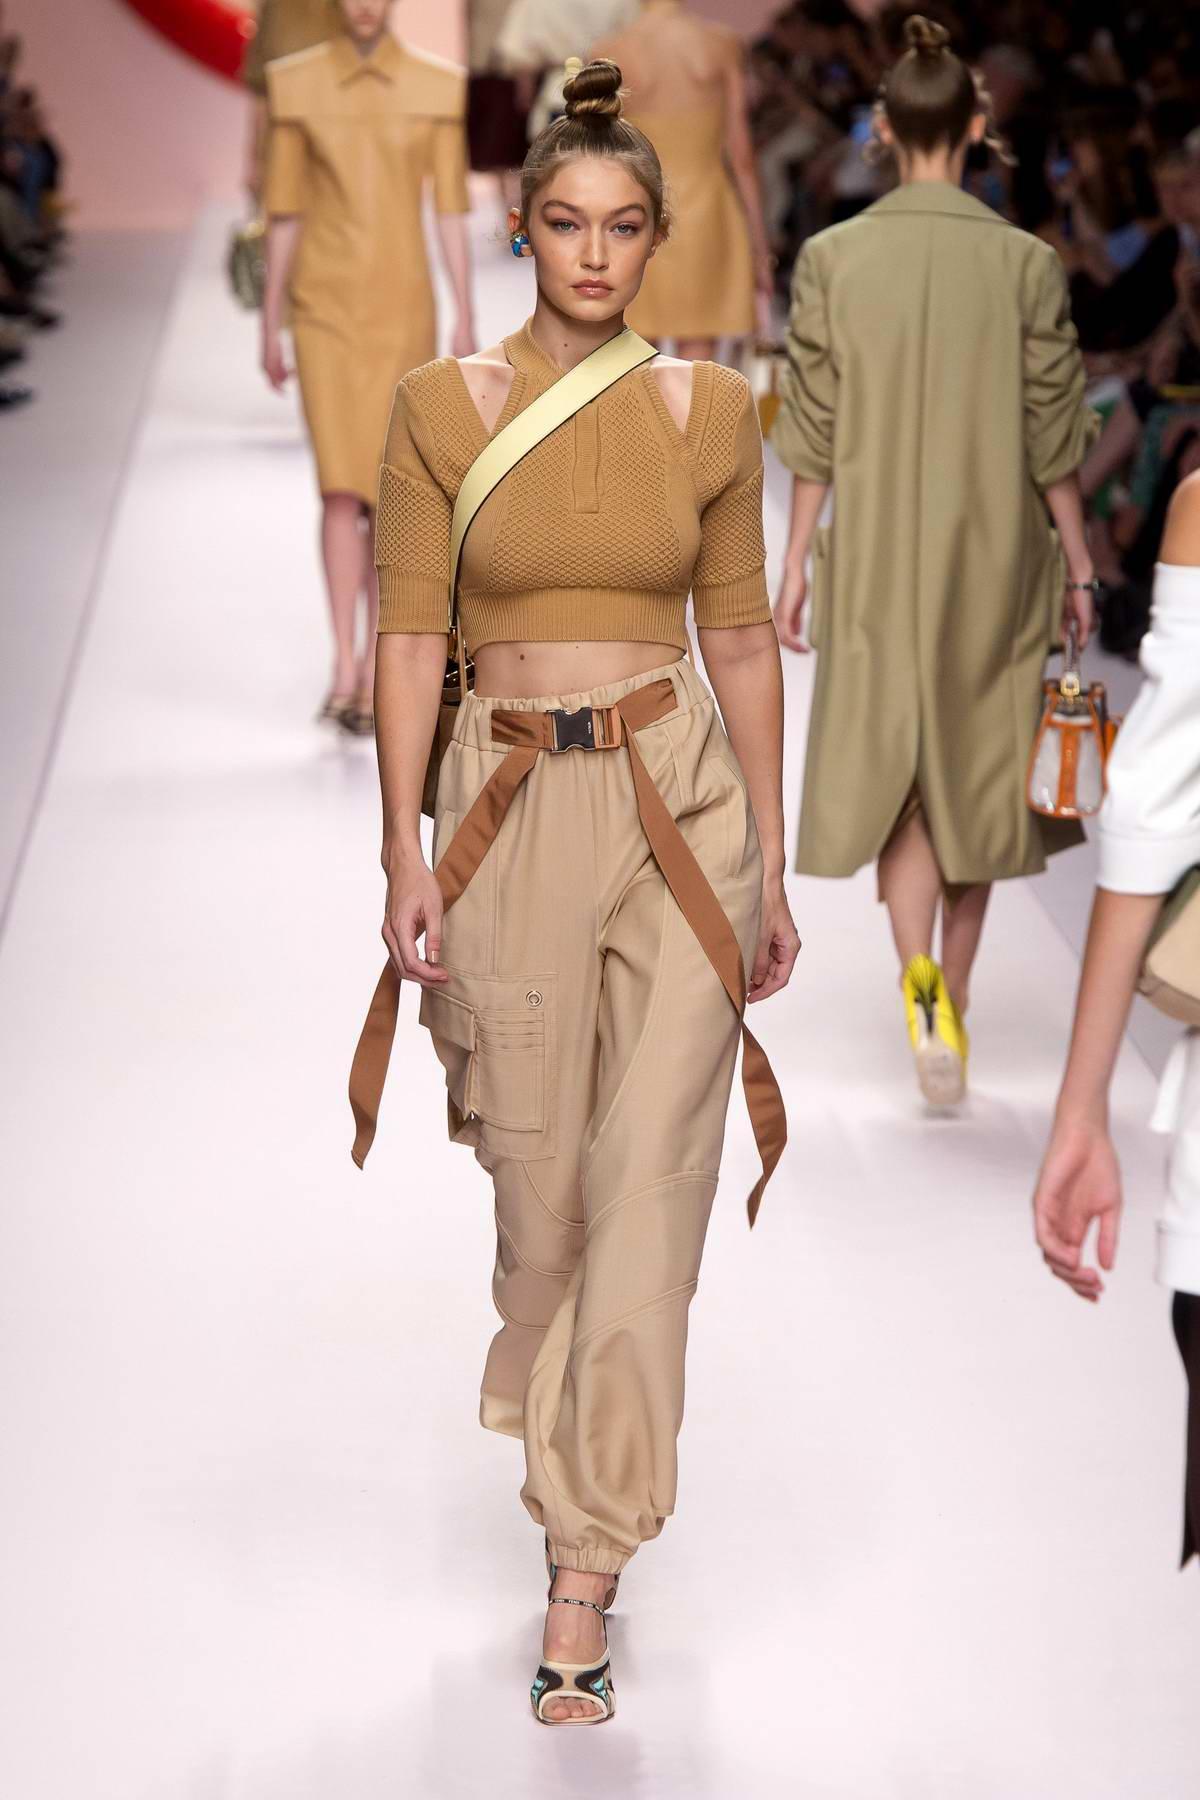 Gigi Hadid walks the runway for Fendi Fashion Show, Summer/Spring 2019 during Milan Fashion Week in Milan, Italy